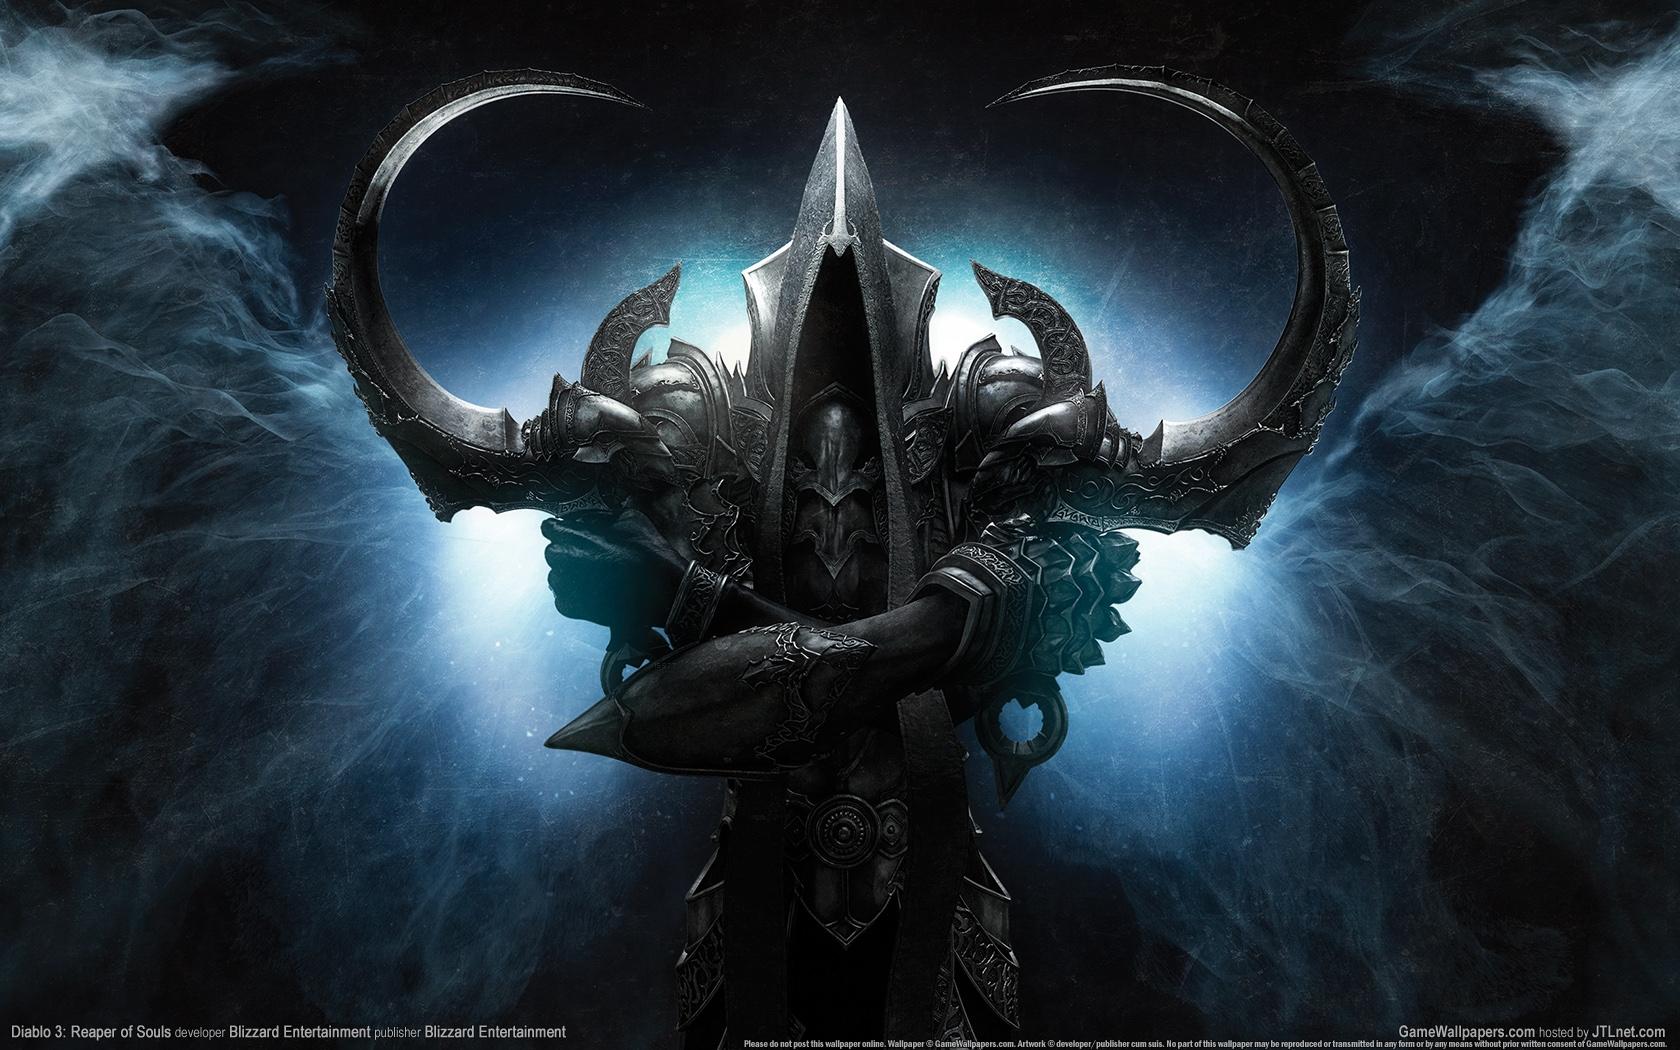 Diablo 3 Reaper of Souls: Update 2.0.5 ist live - Patch Notes - Leser-News von Halloween Demon